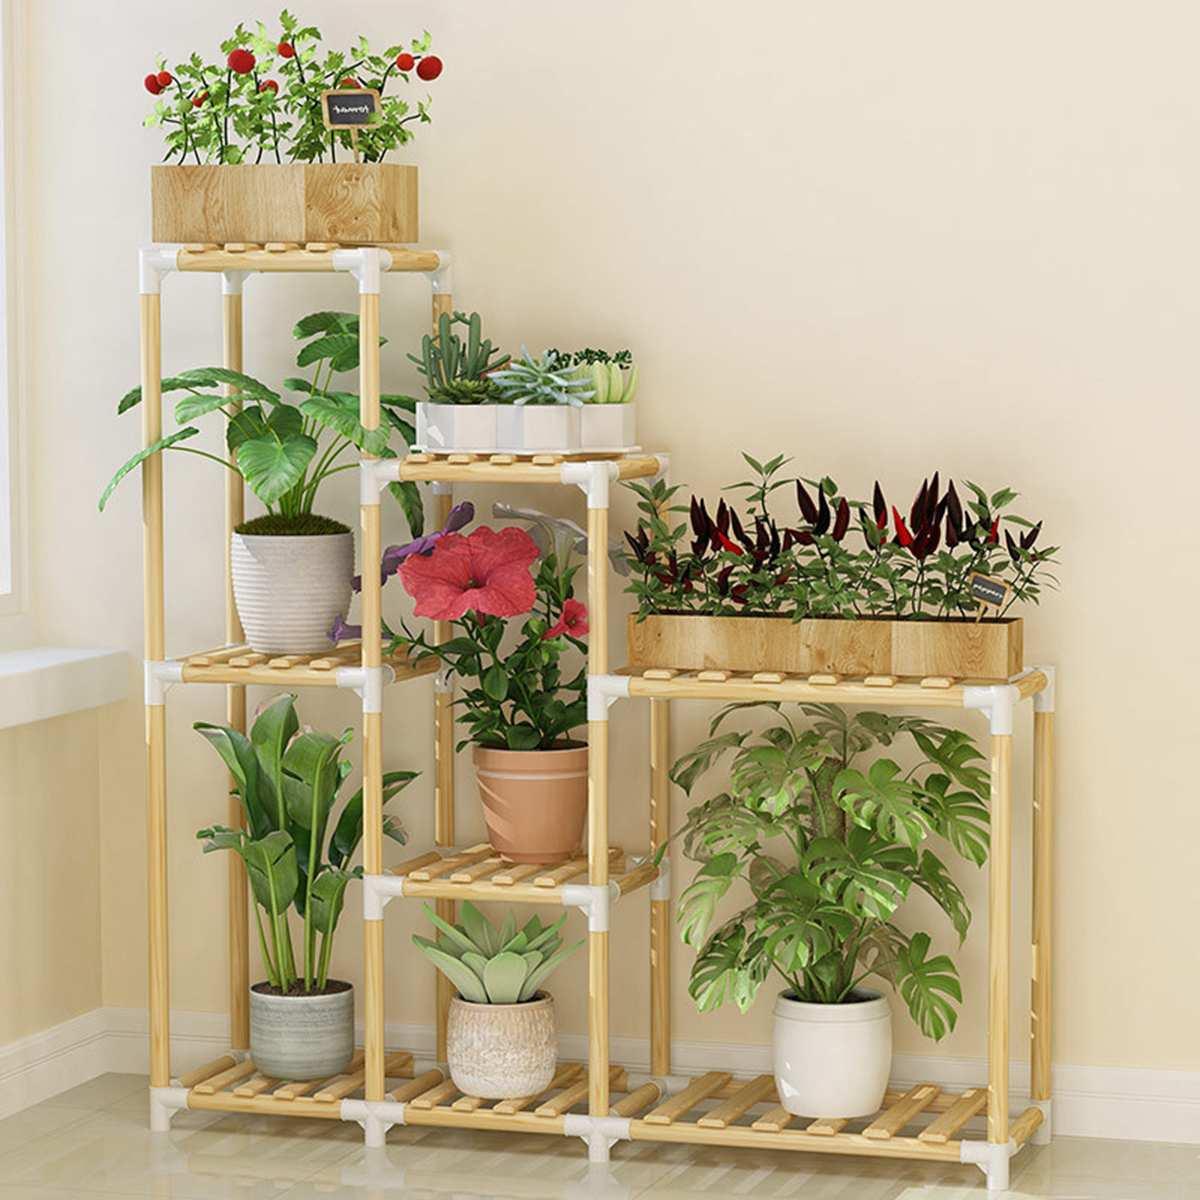 Ahşap çiçek rafı bitki standı çok katmanlı çiçek standı rafları balkon çiçek raf kahve Bar kapalı bahçe ahşap bitki standı